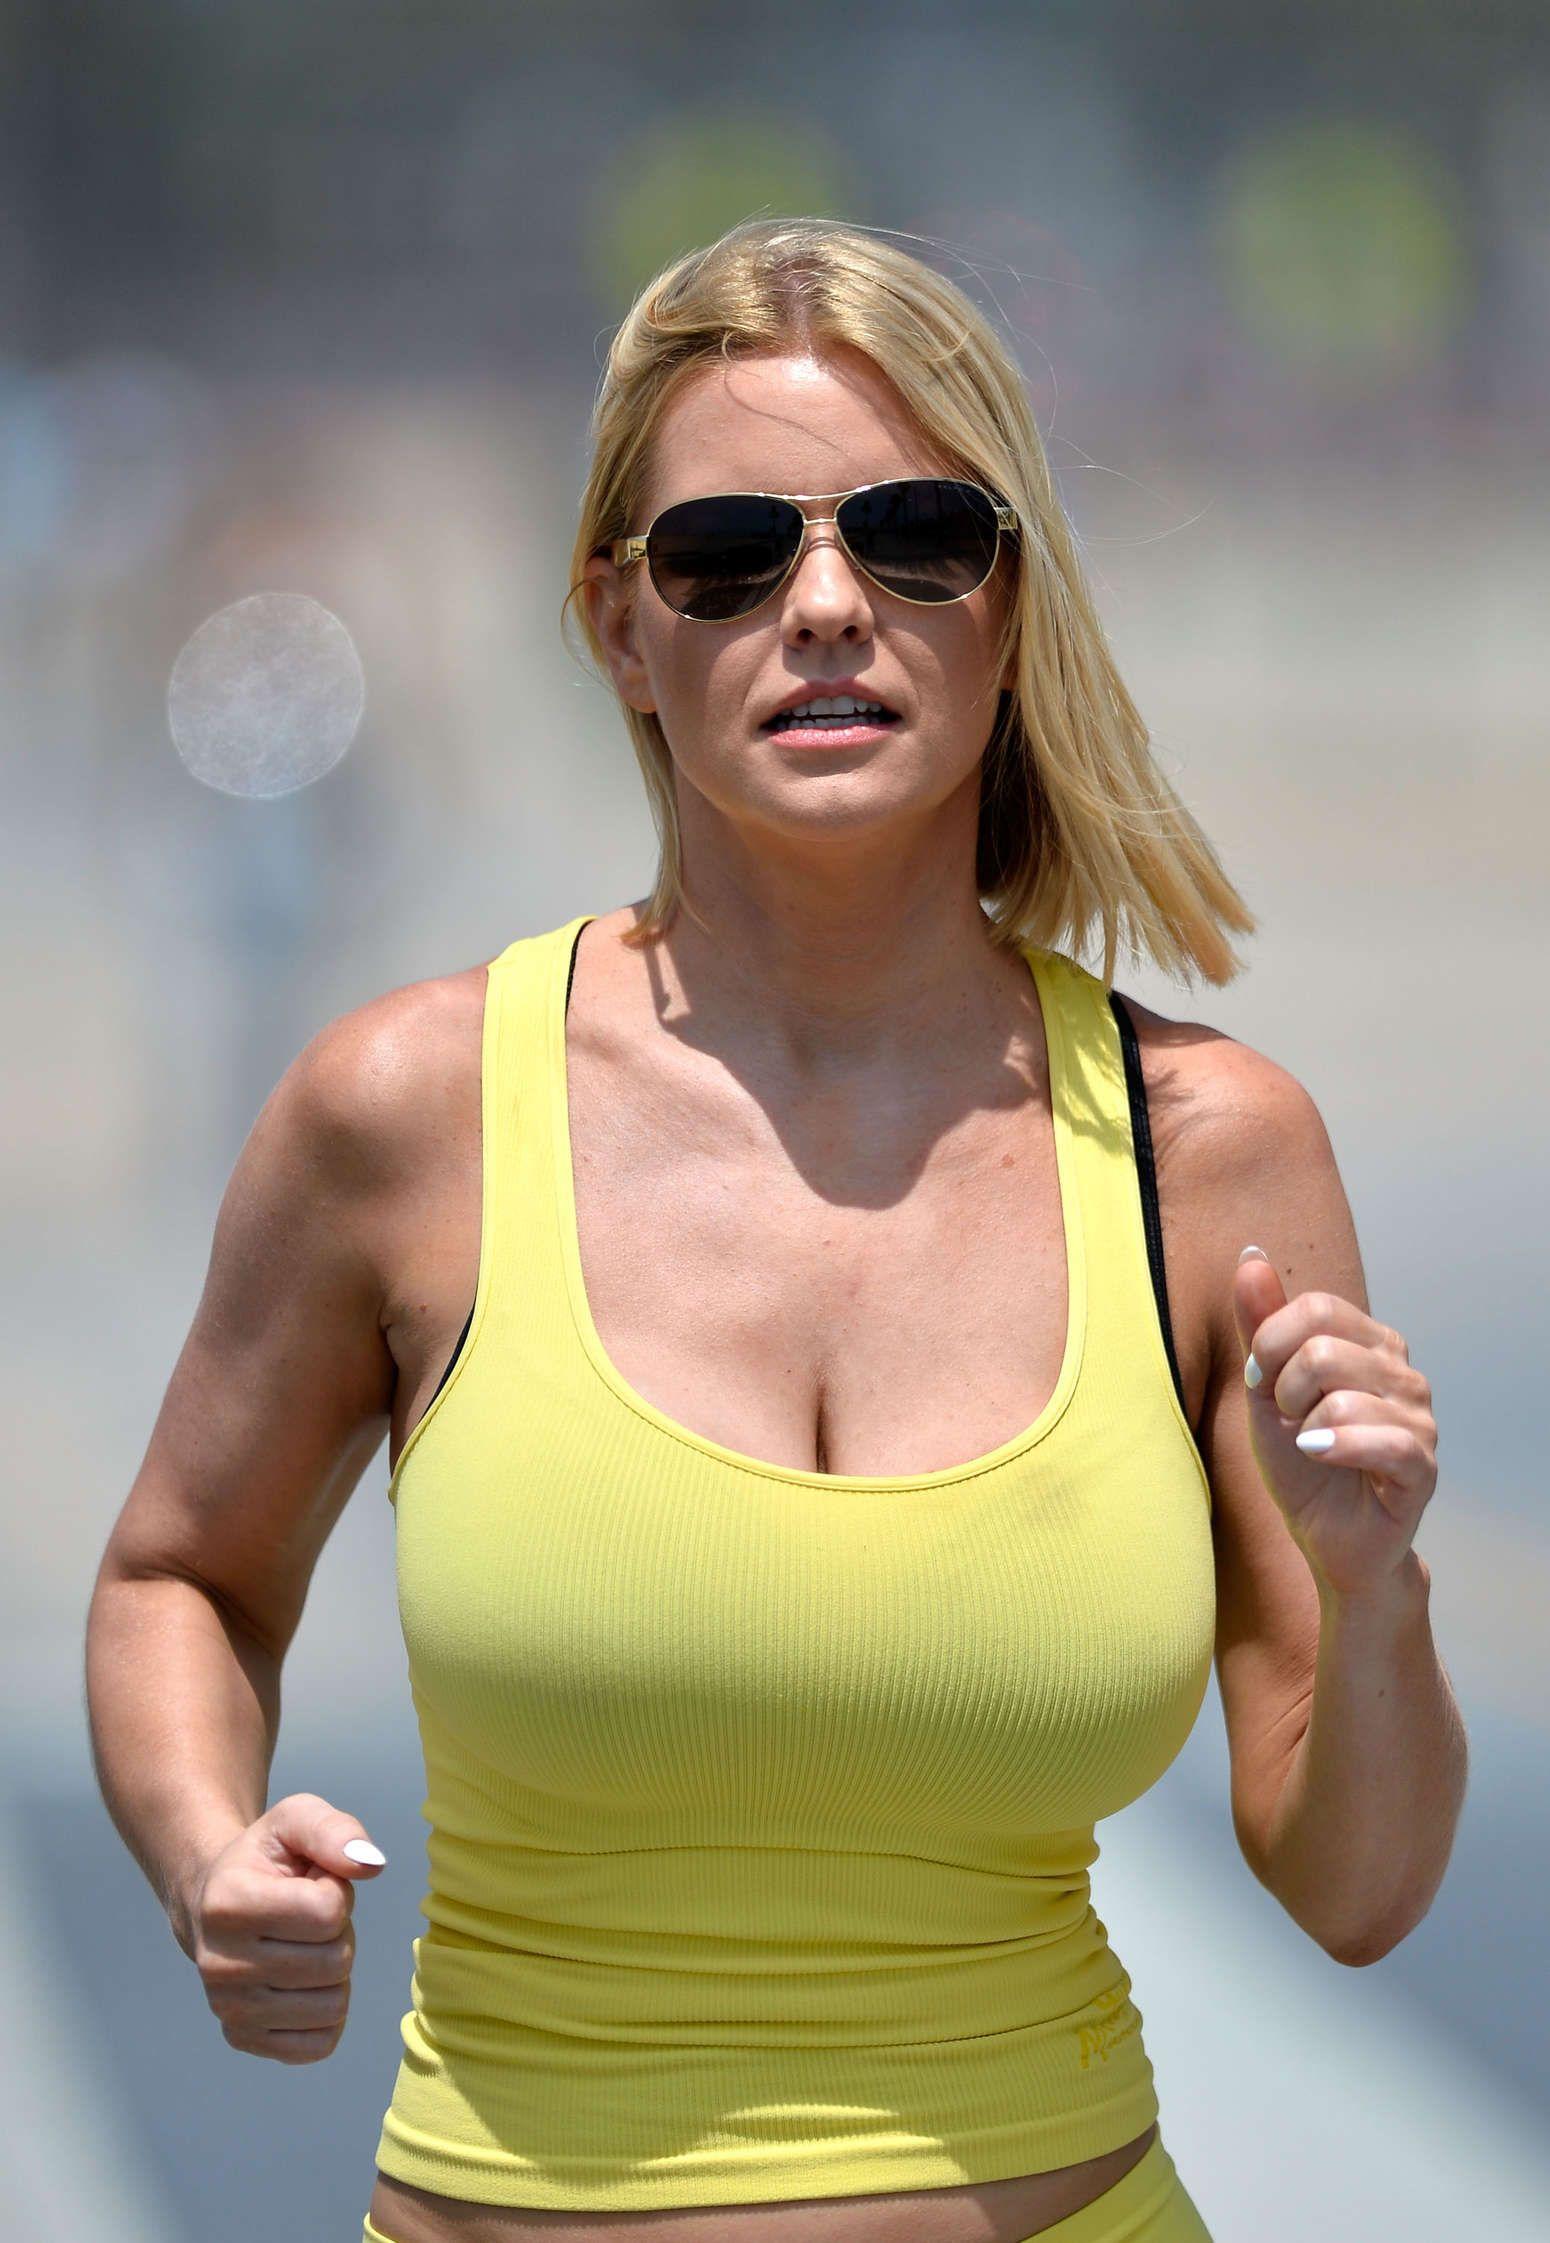 Carrie keagan hot nudes (12 photos), Sideboobs Celebrites fotos